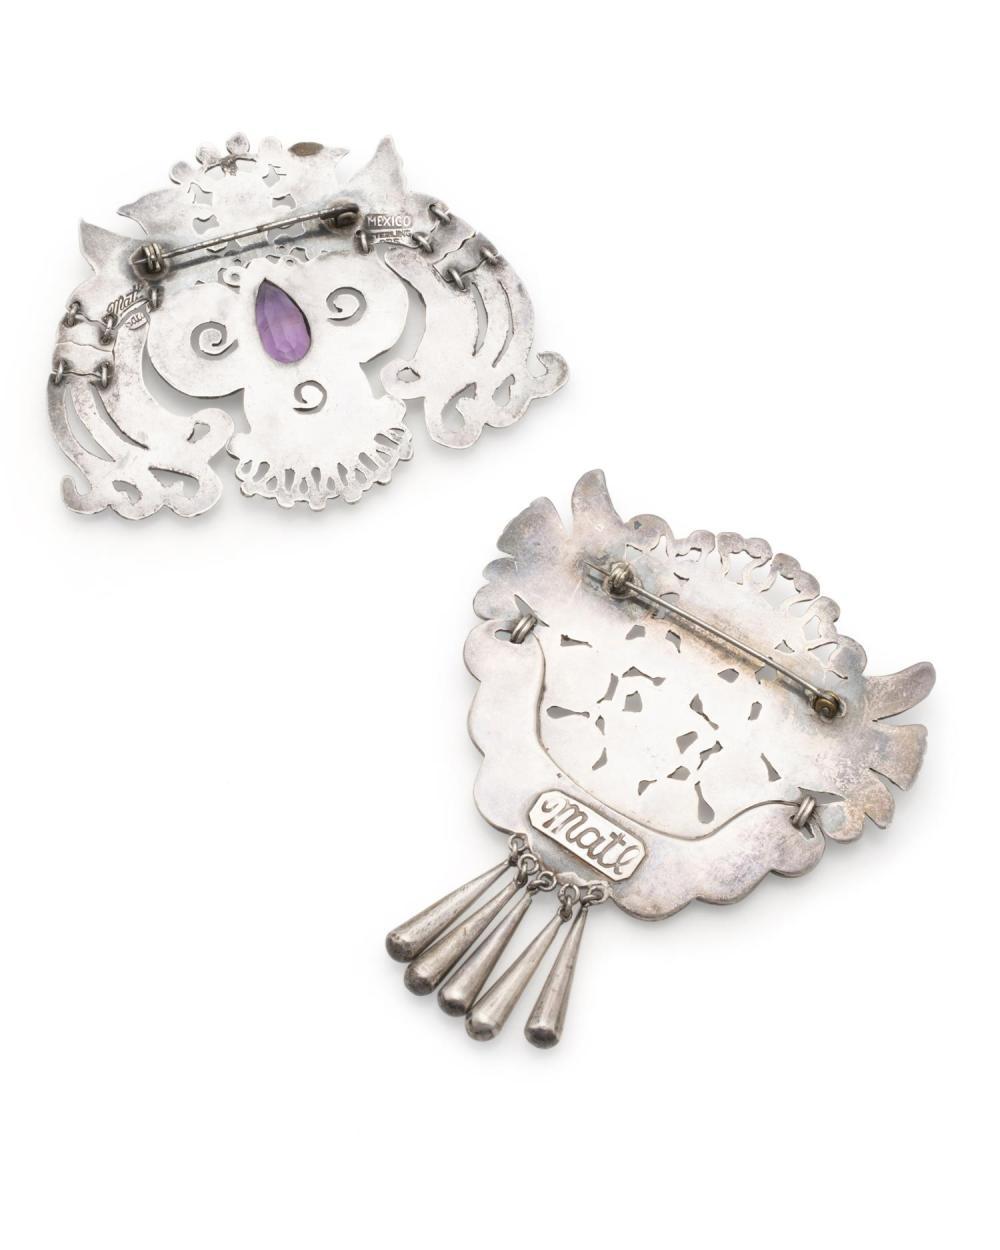 Two Matilde Poulat bird brooches